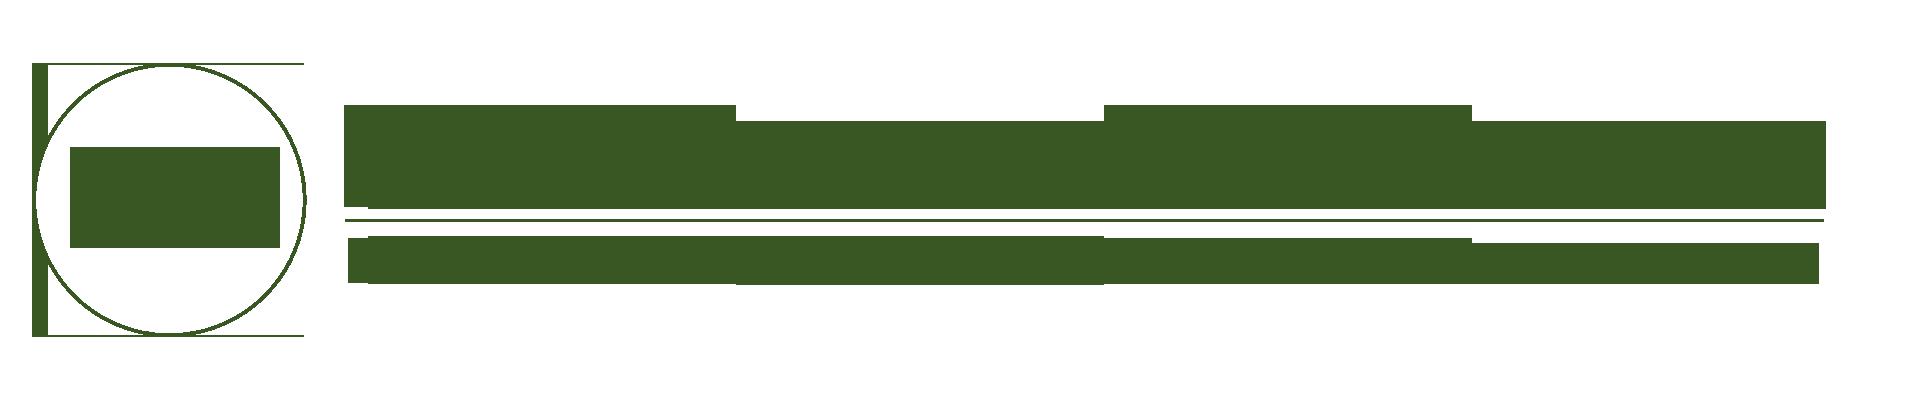 Kosmosaic Books - G.L. Breedon